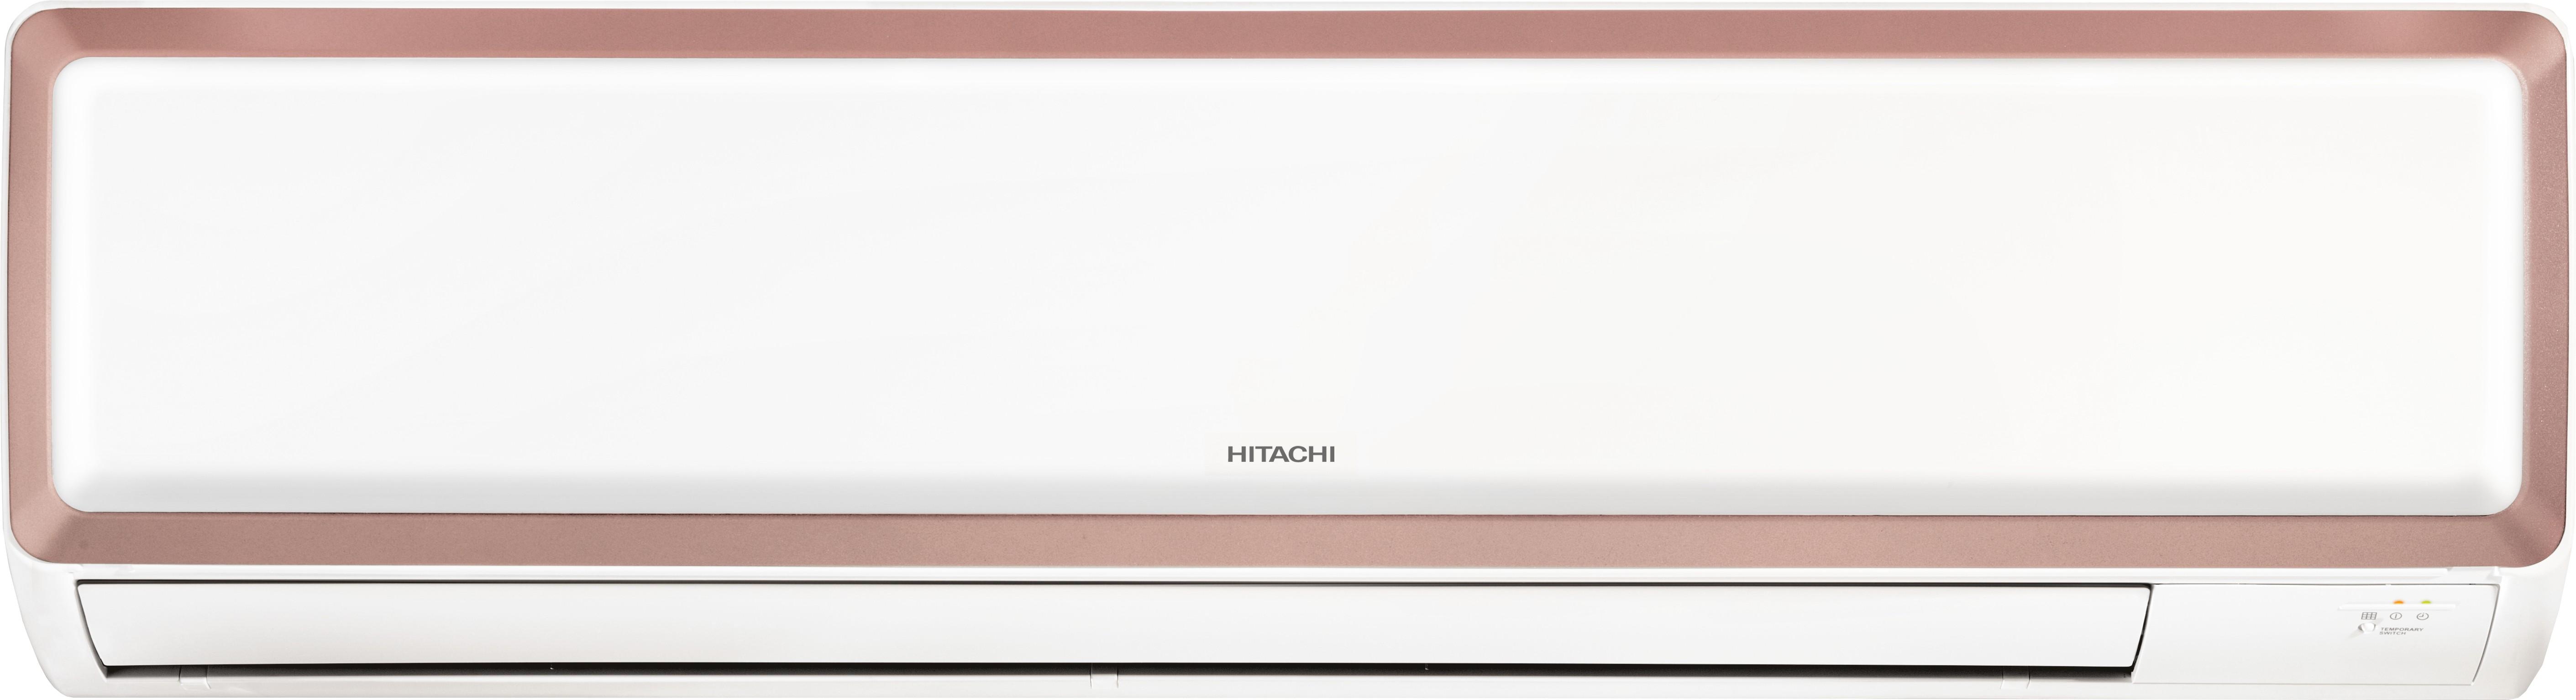 Hitachi 2 Tons Inverter Split AC Copper (Hitachi)  Buy Online